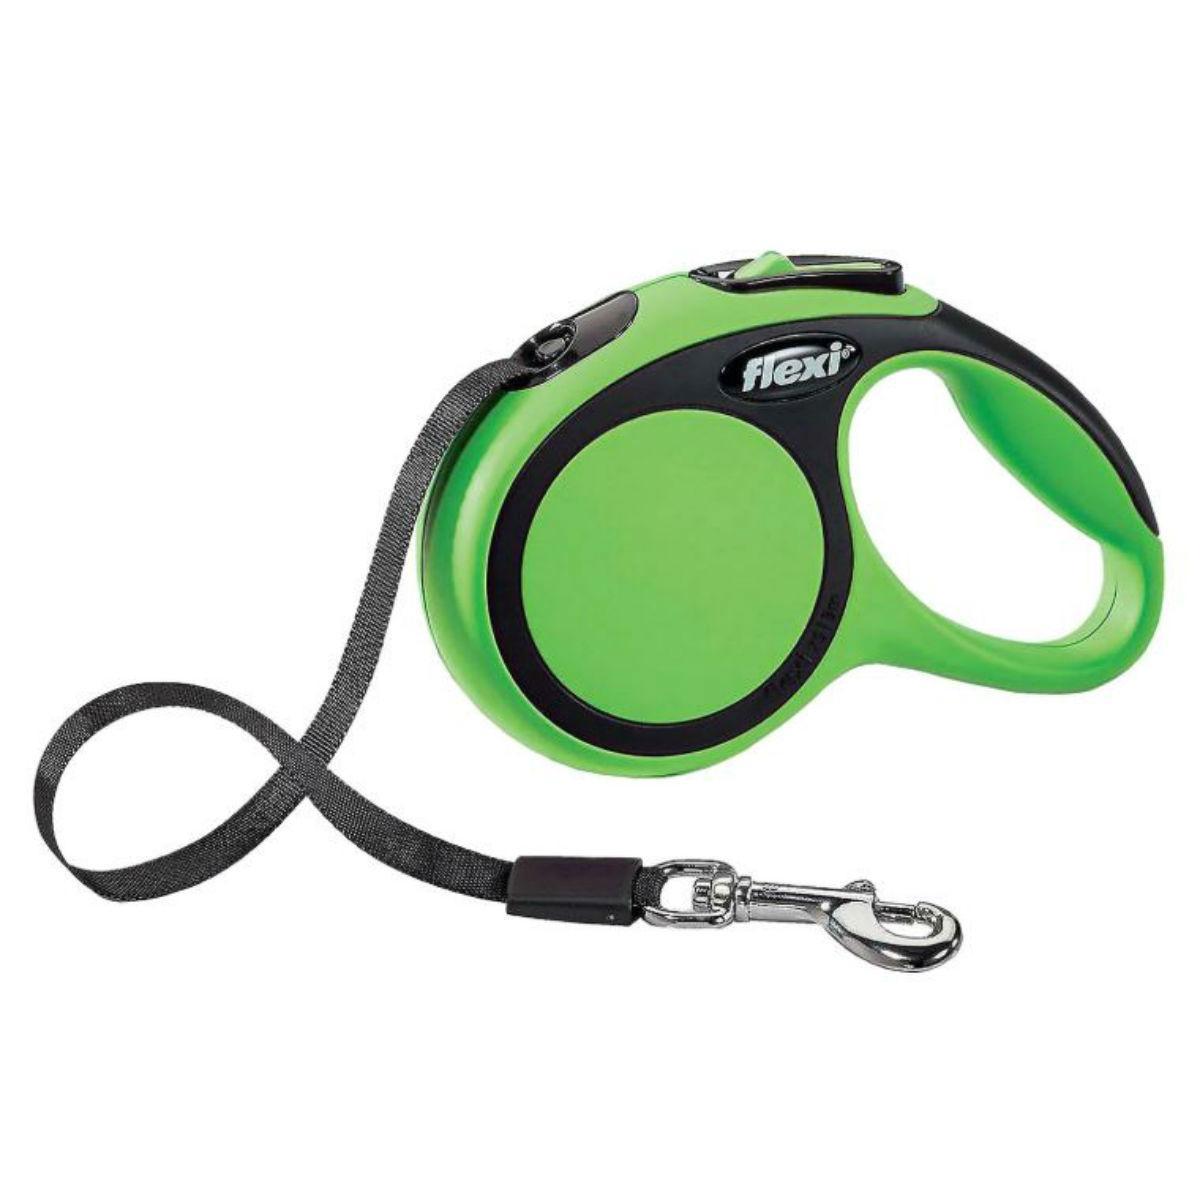 Flexi Comfort Tape Retractable Dog Leash - Green